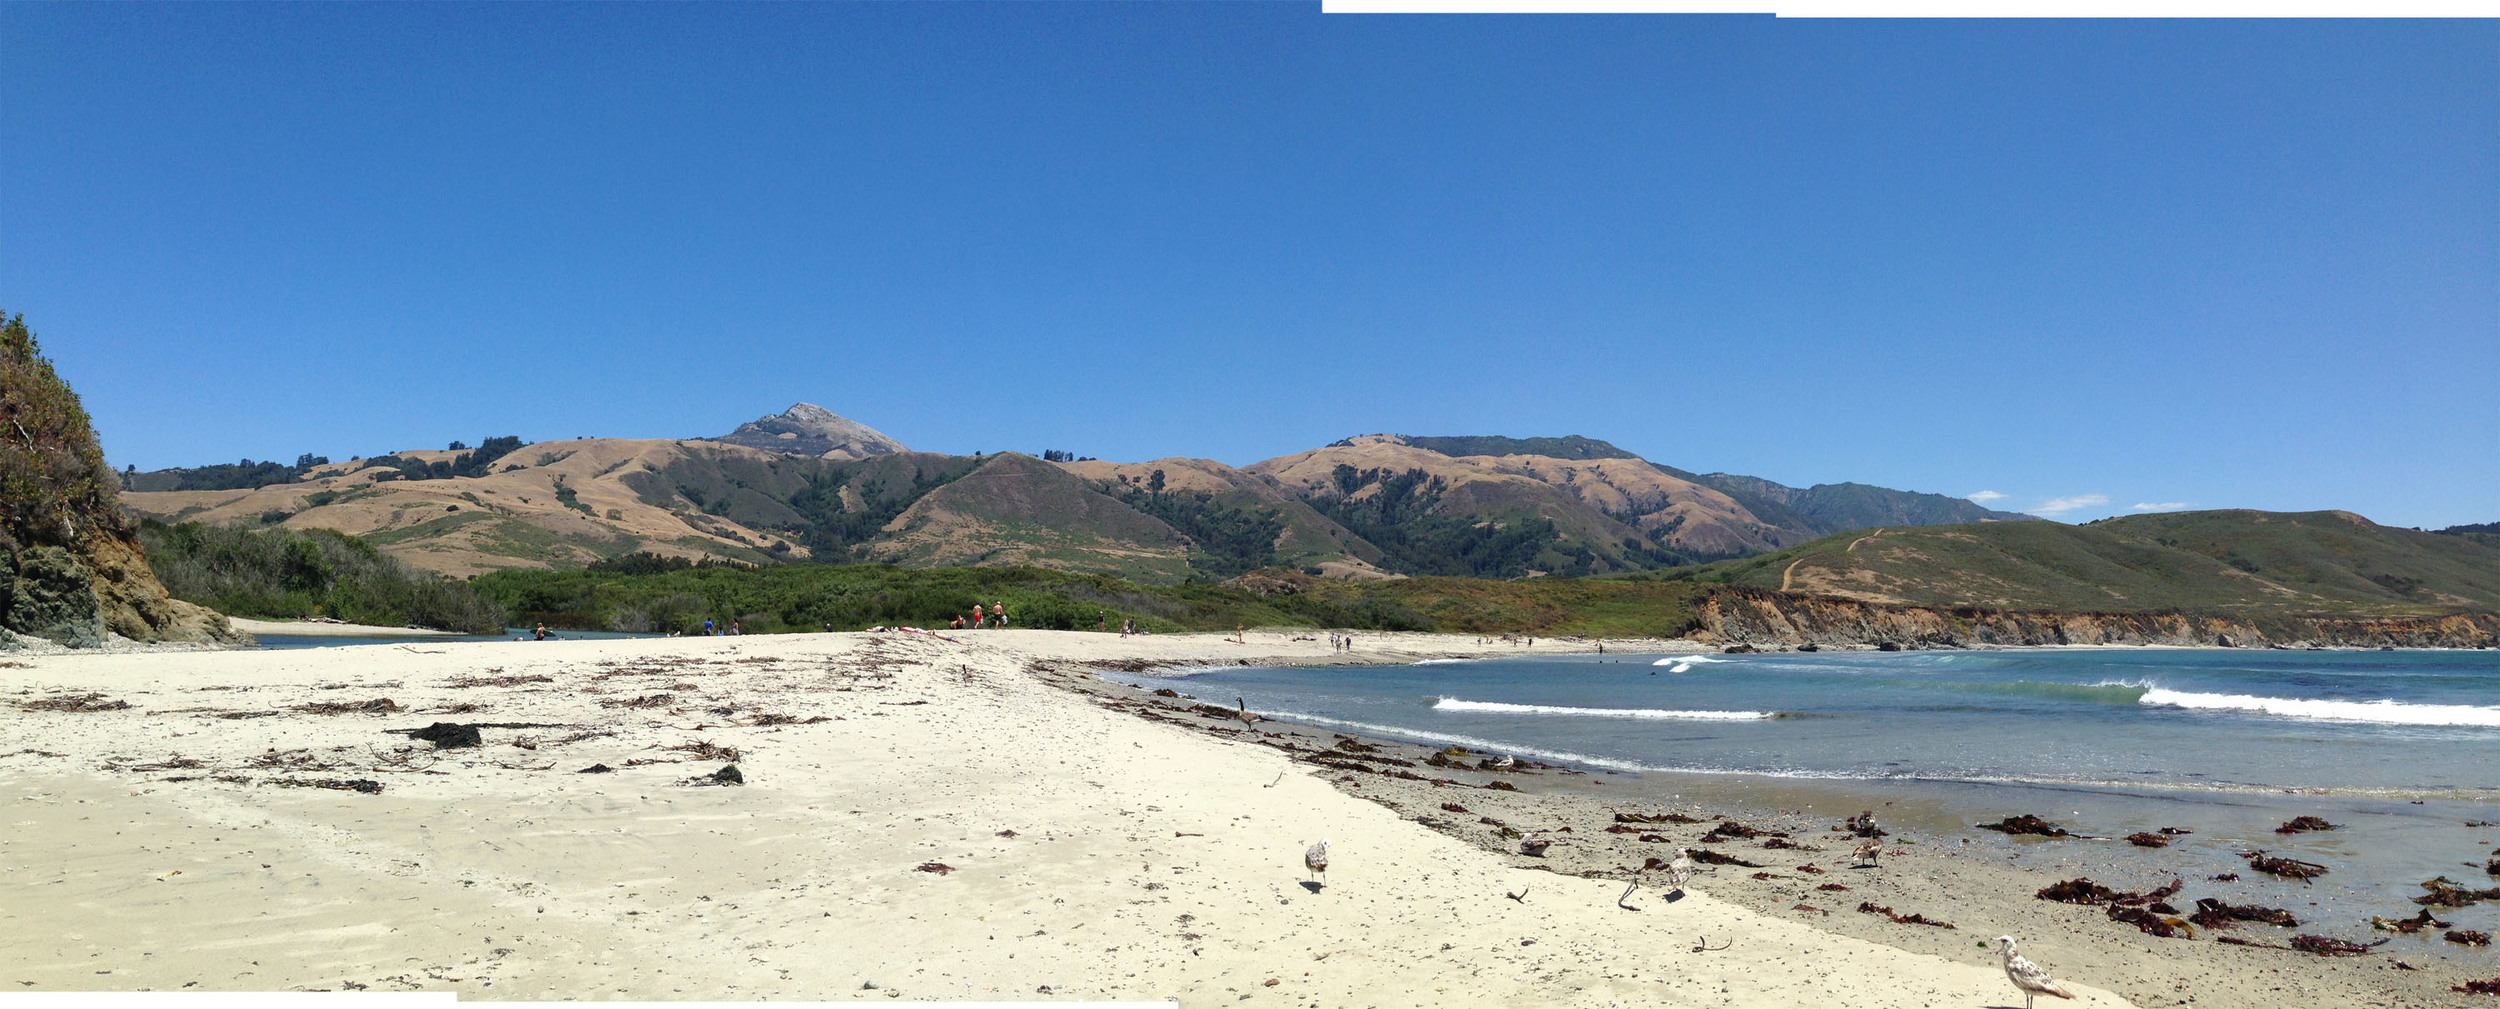 Where the ocean meets the river, Andrew Molera Beach